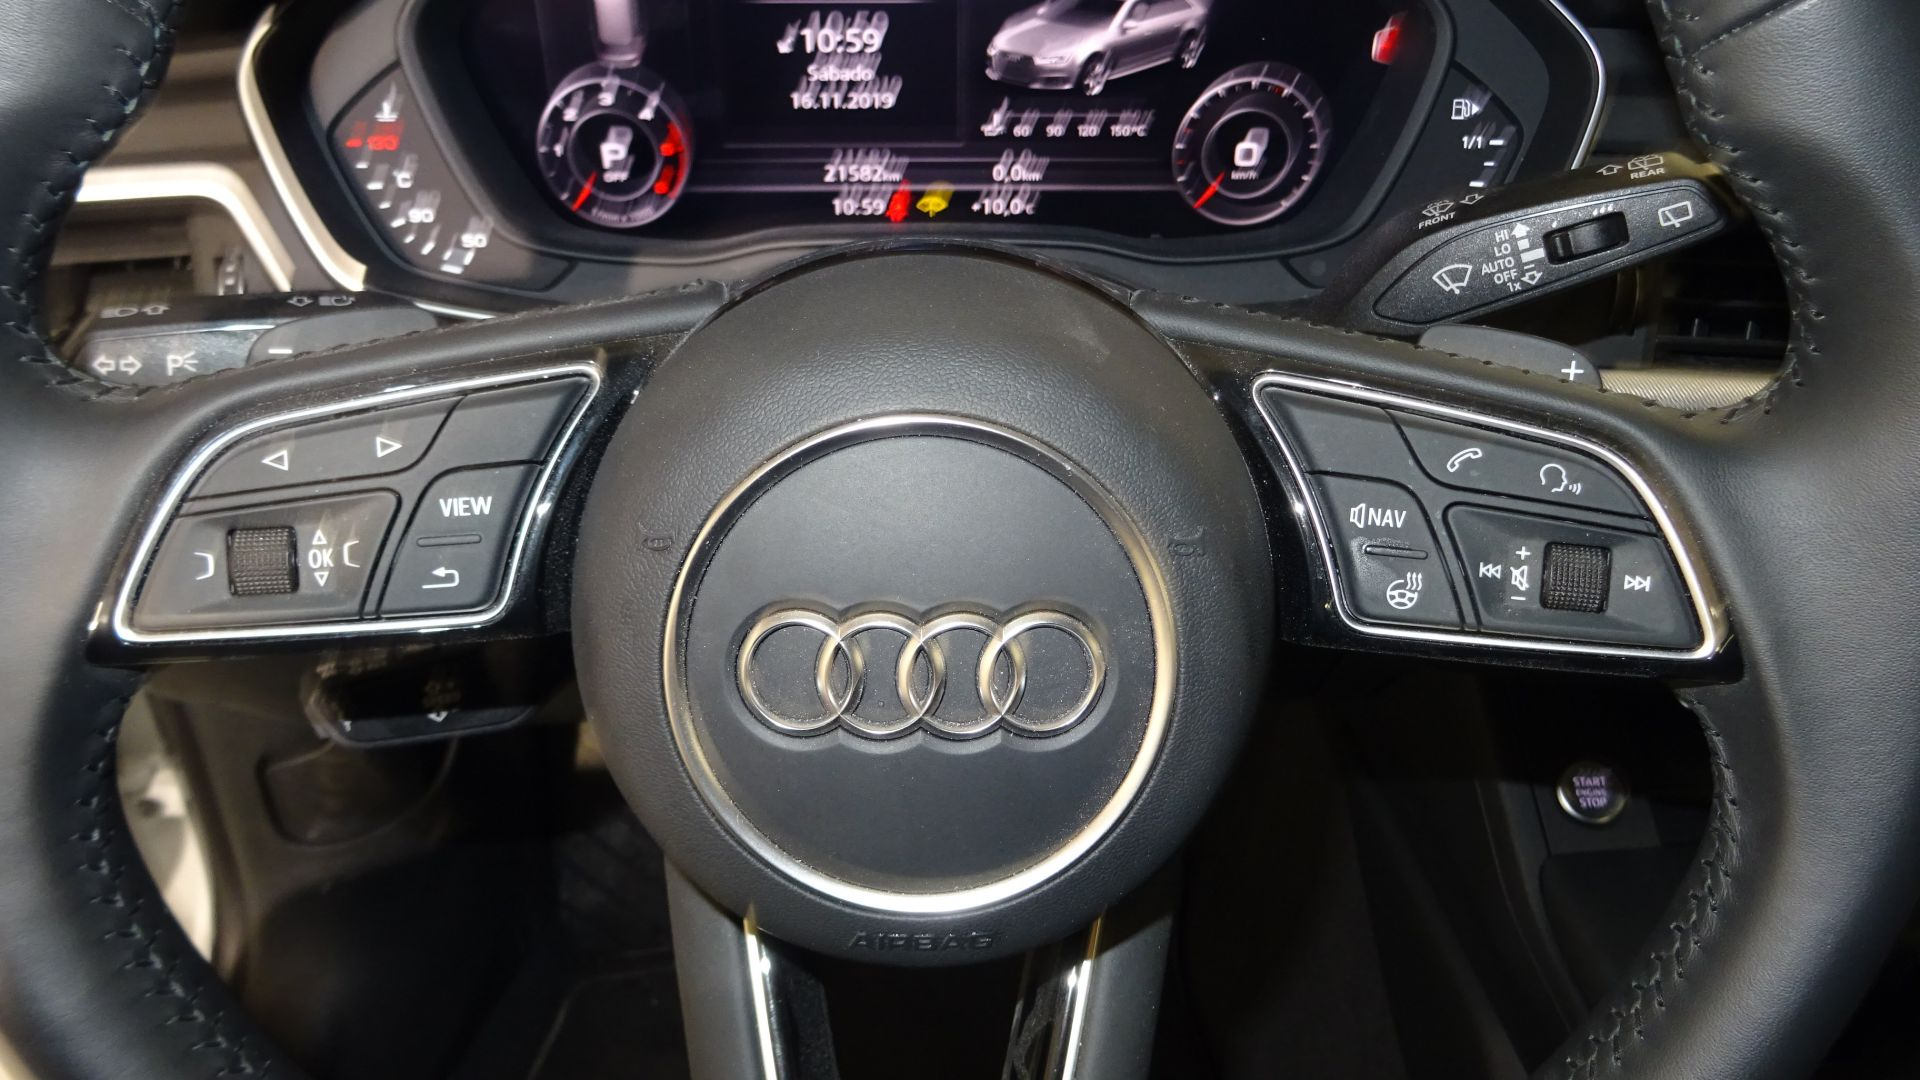 Audi A4 Avant Black line 35 TDI 110kW S tronic